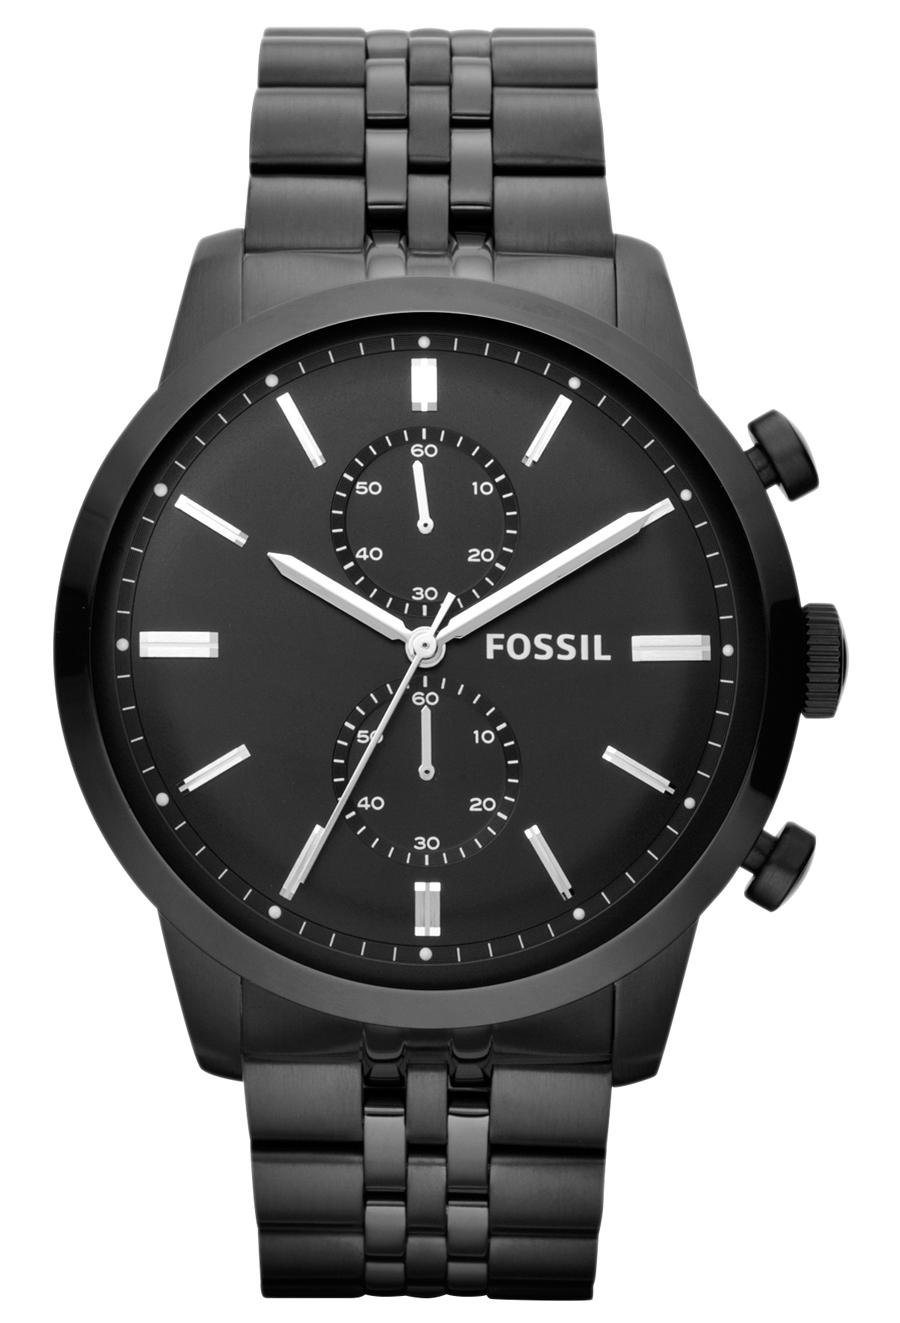 Stort herreur i sort rustfrit stål - Fossil Townsman FS4787